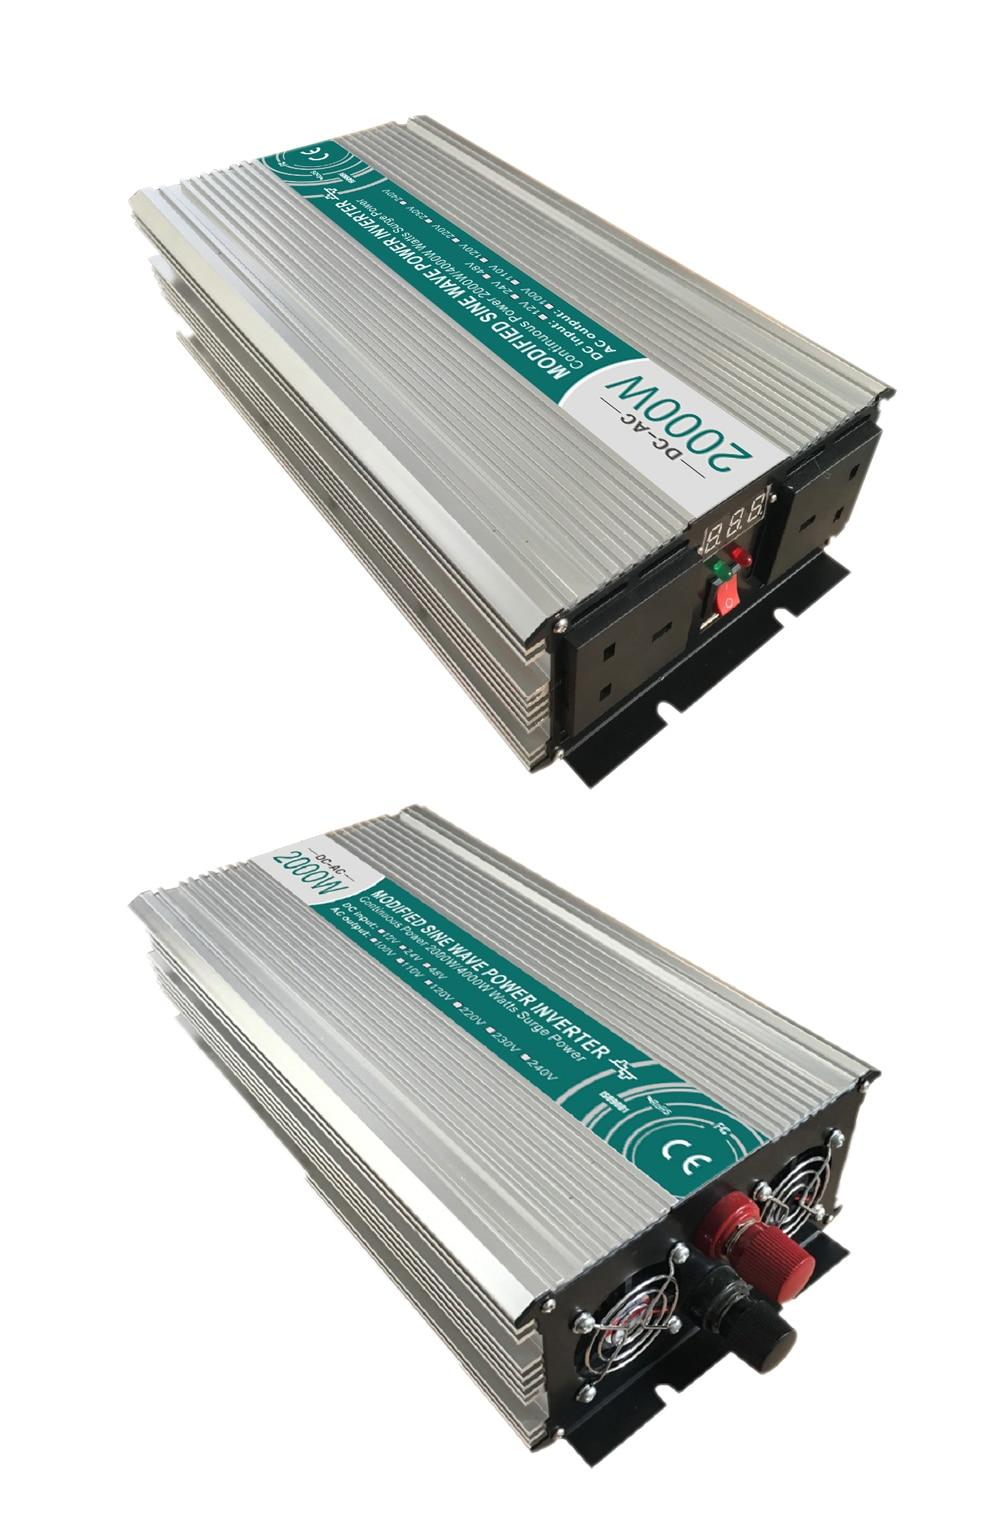 Smart Modified Sine Wave Inverter Dc 12v 24v 48v To Ac 110v 220v 300watt Circuit Diagram Aeproduct